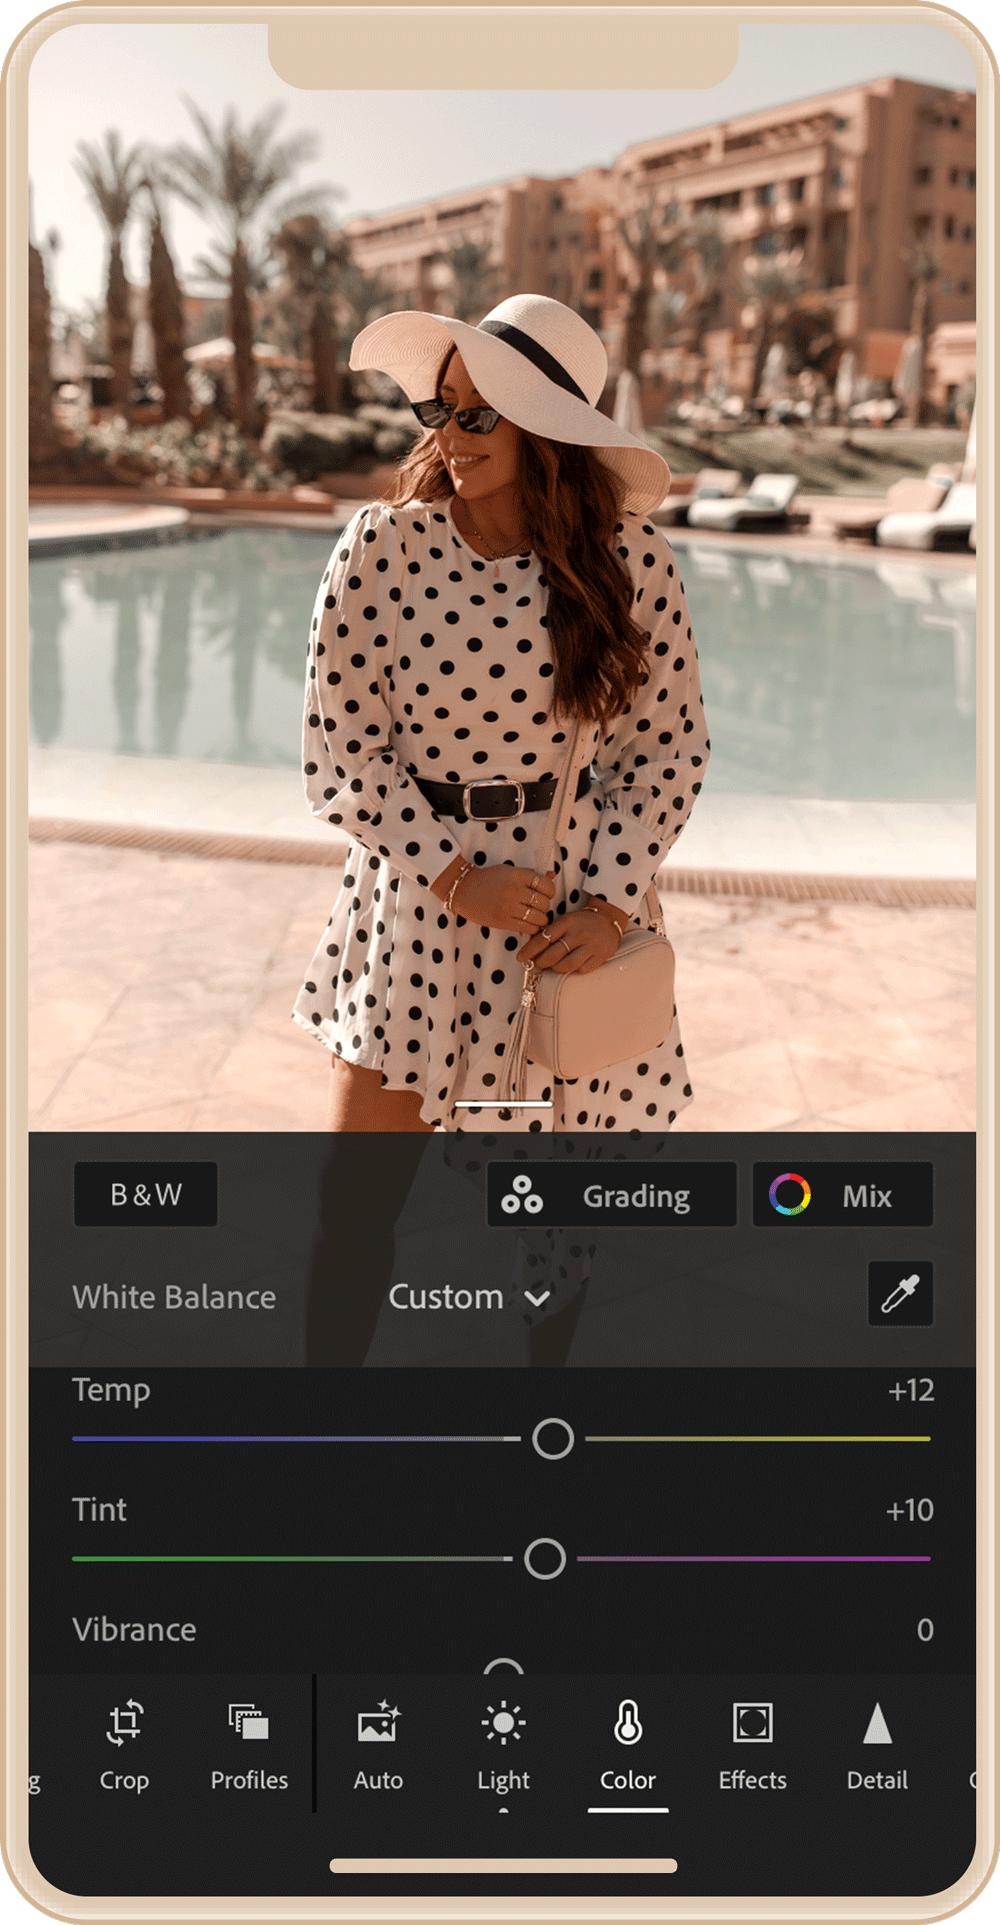 kelseyinlondon-perfect-instagram-feed-theme-lightroom-preset-blogger-influencer